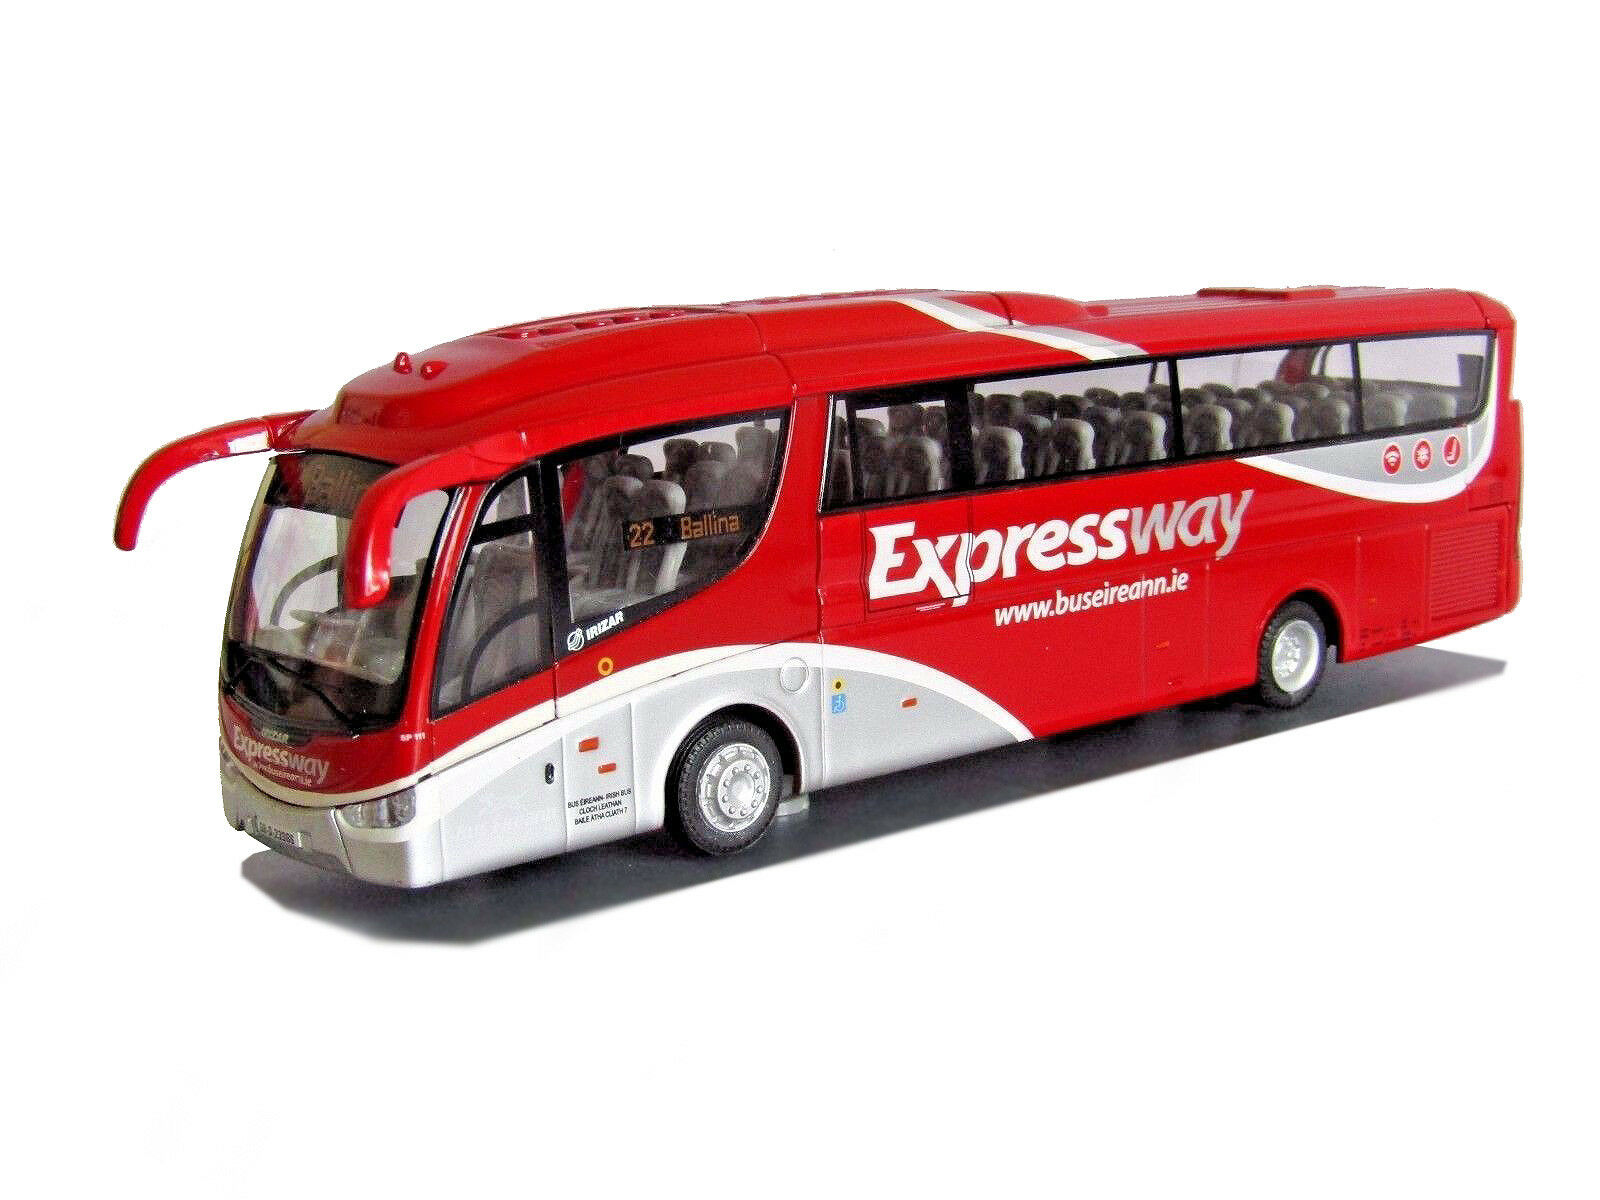 Corgi OOC Scania Irizar PB Bus Eireann Expressway Ballina 1 76 Scale CP46213B